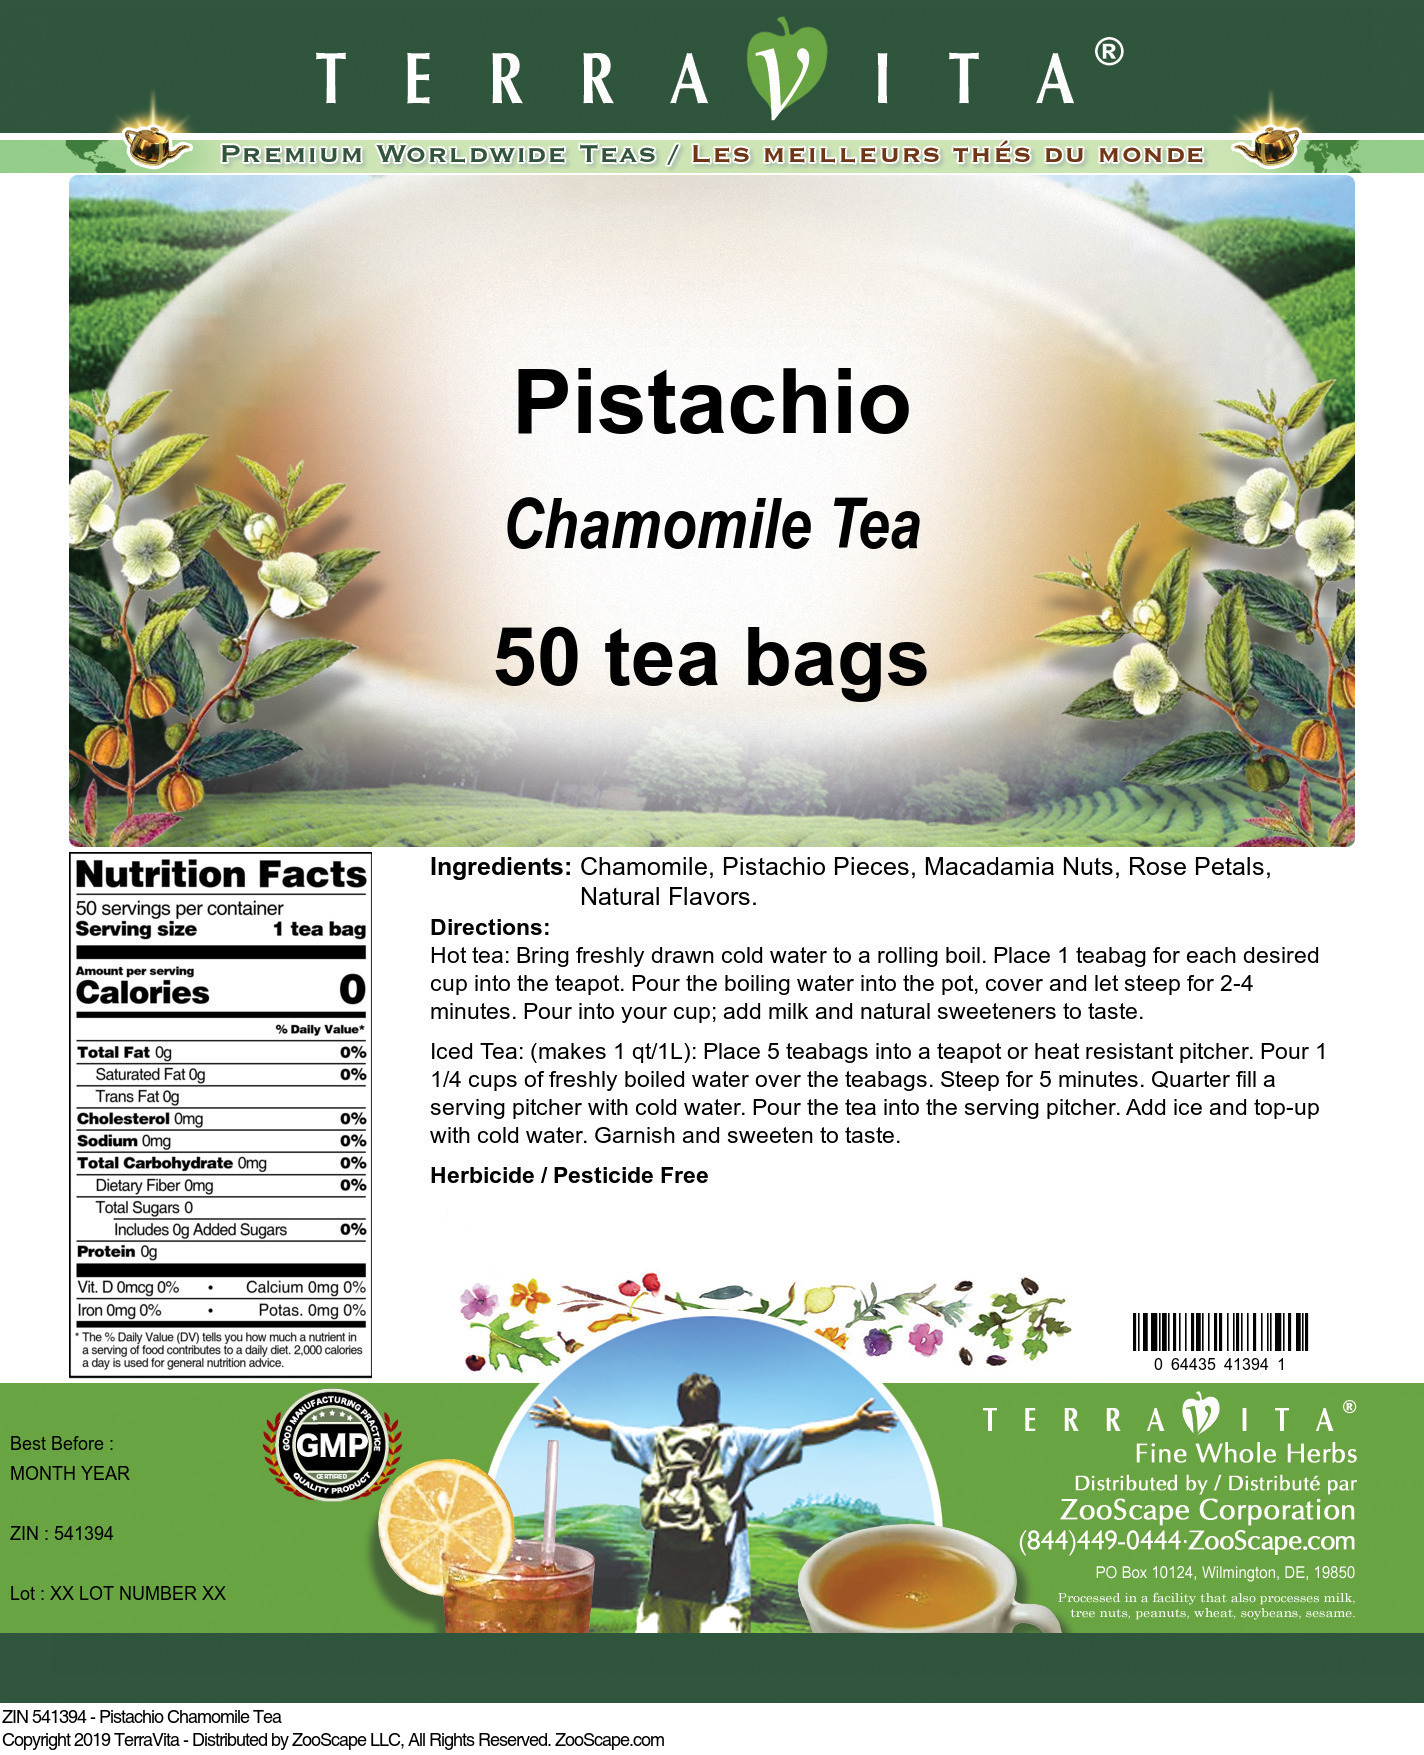 Pistachio Chamomile Tea